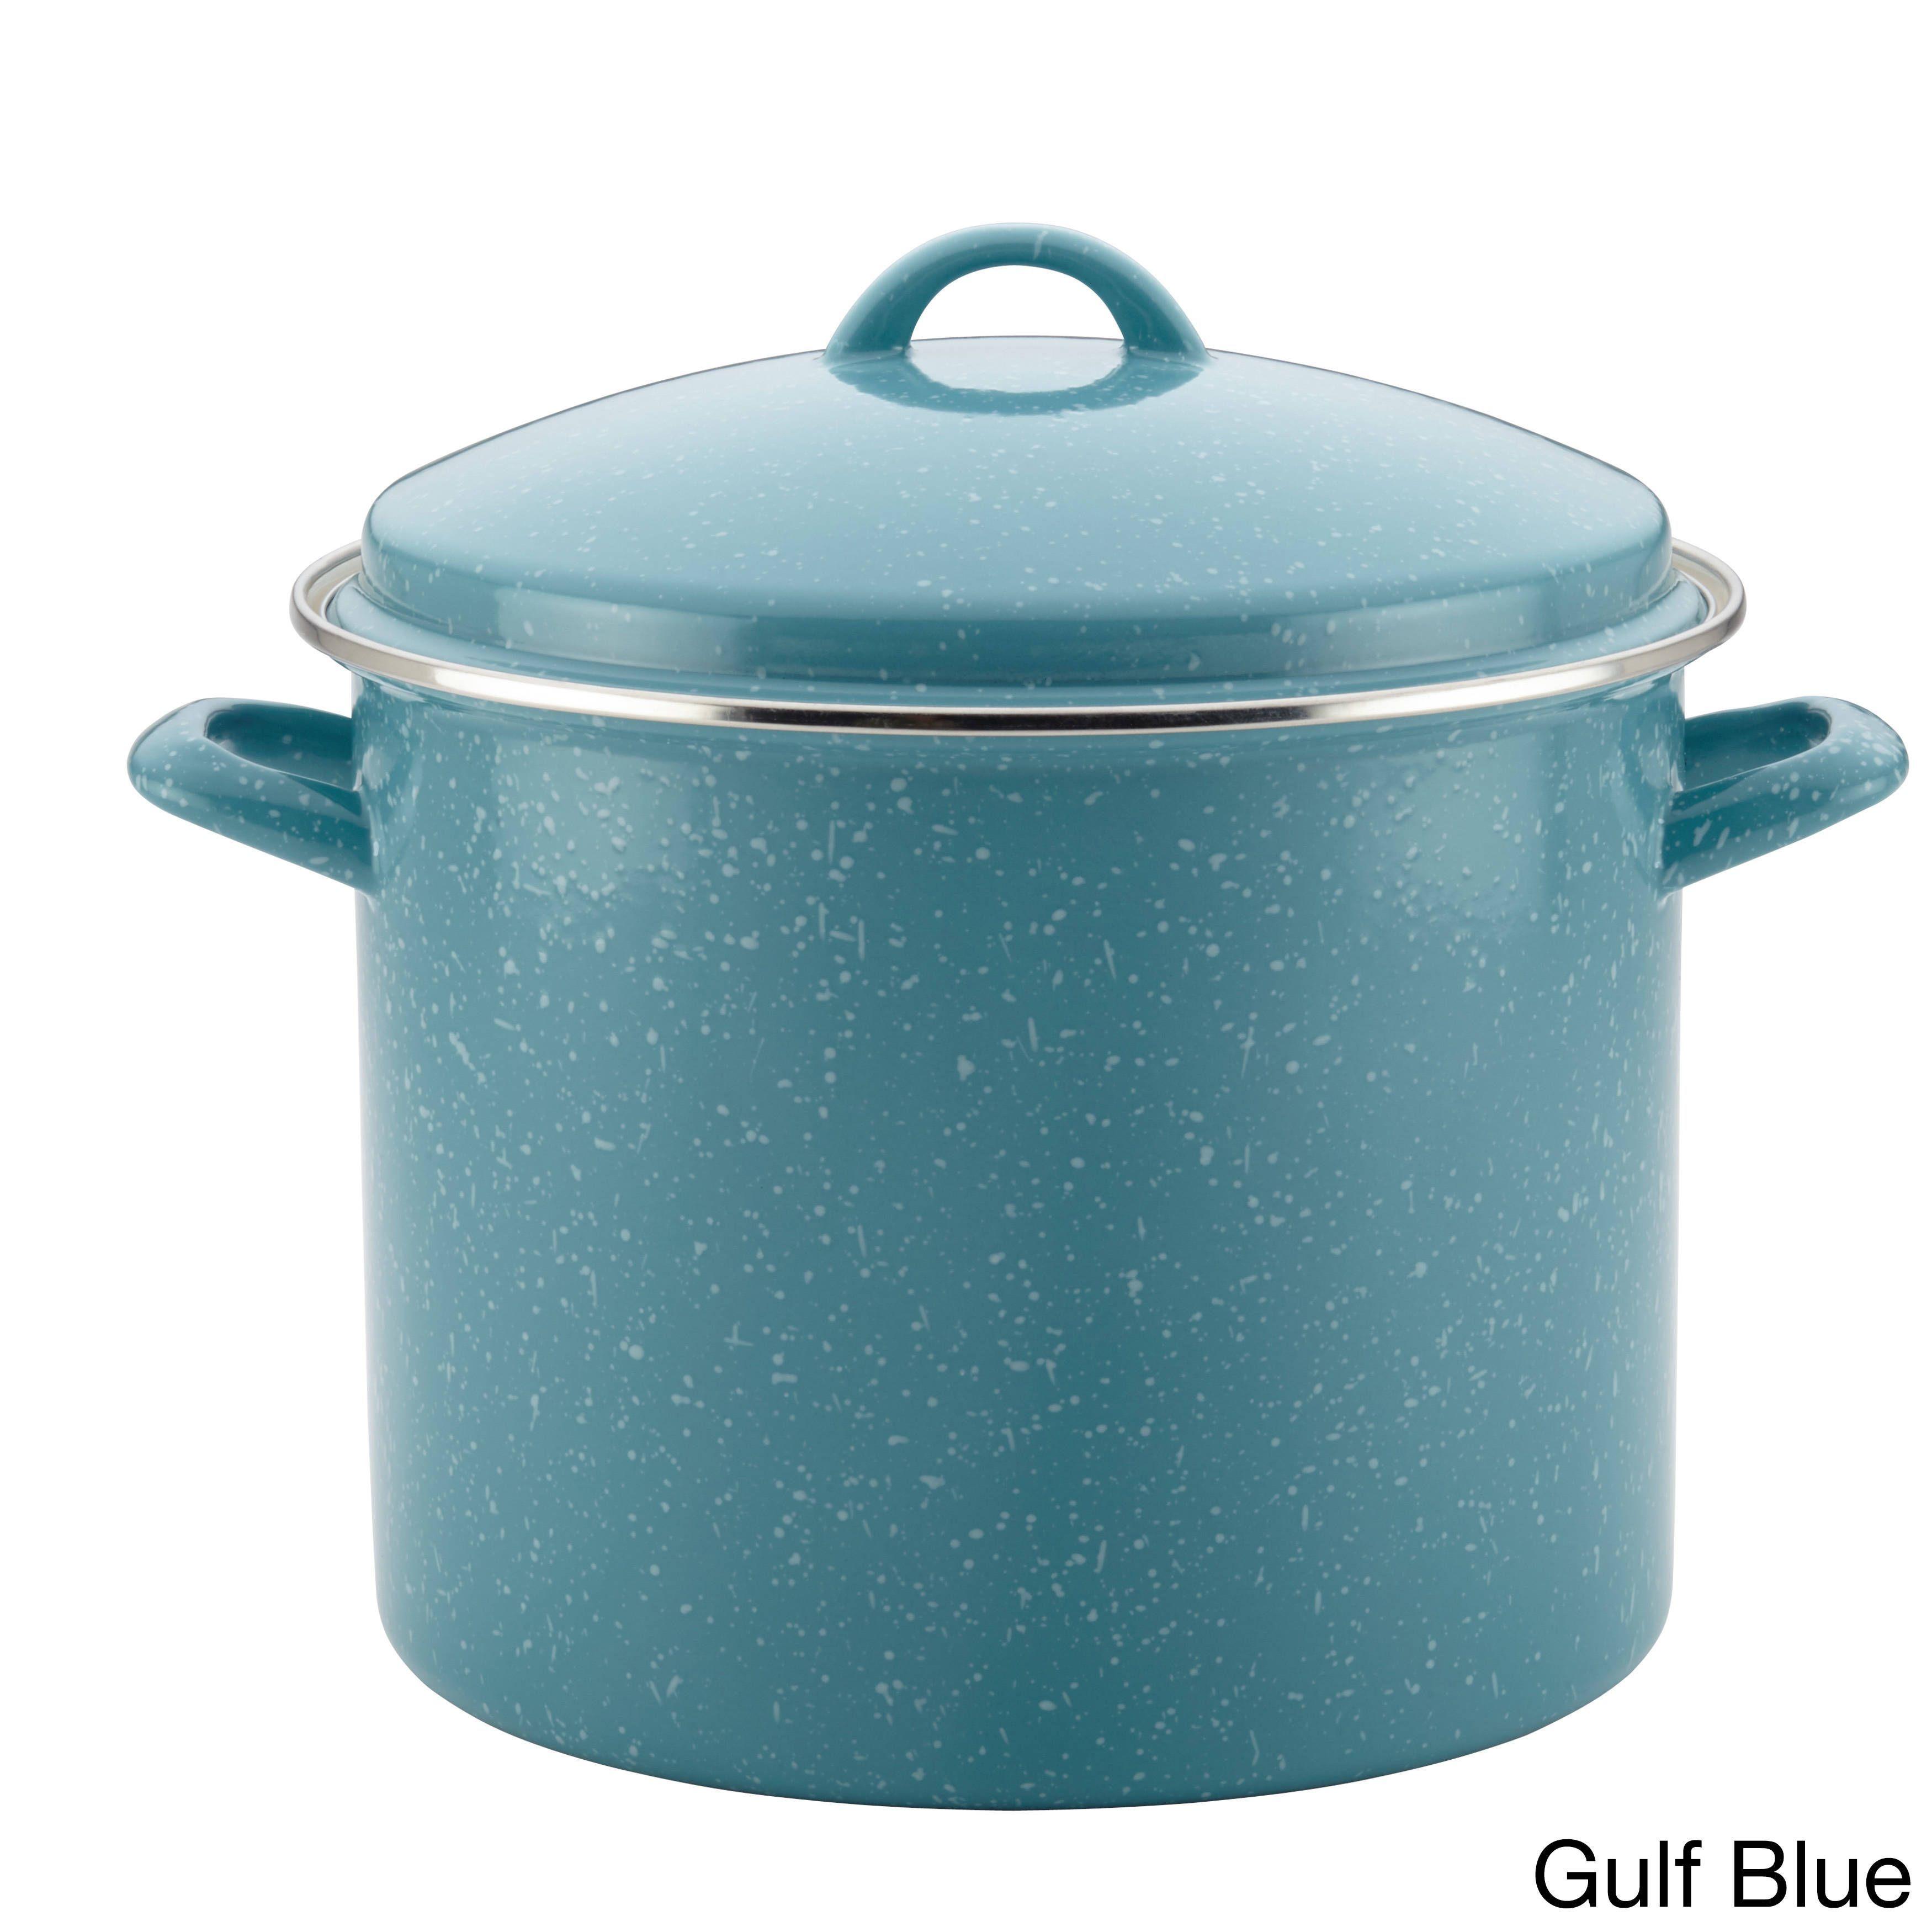 Paula Deen Enamel on Steel Covered Stockpot, 12-Quart (Gulf Blue Speckle), Size 12 Quart (Aluminum)